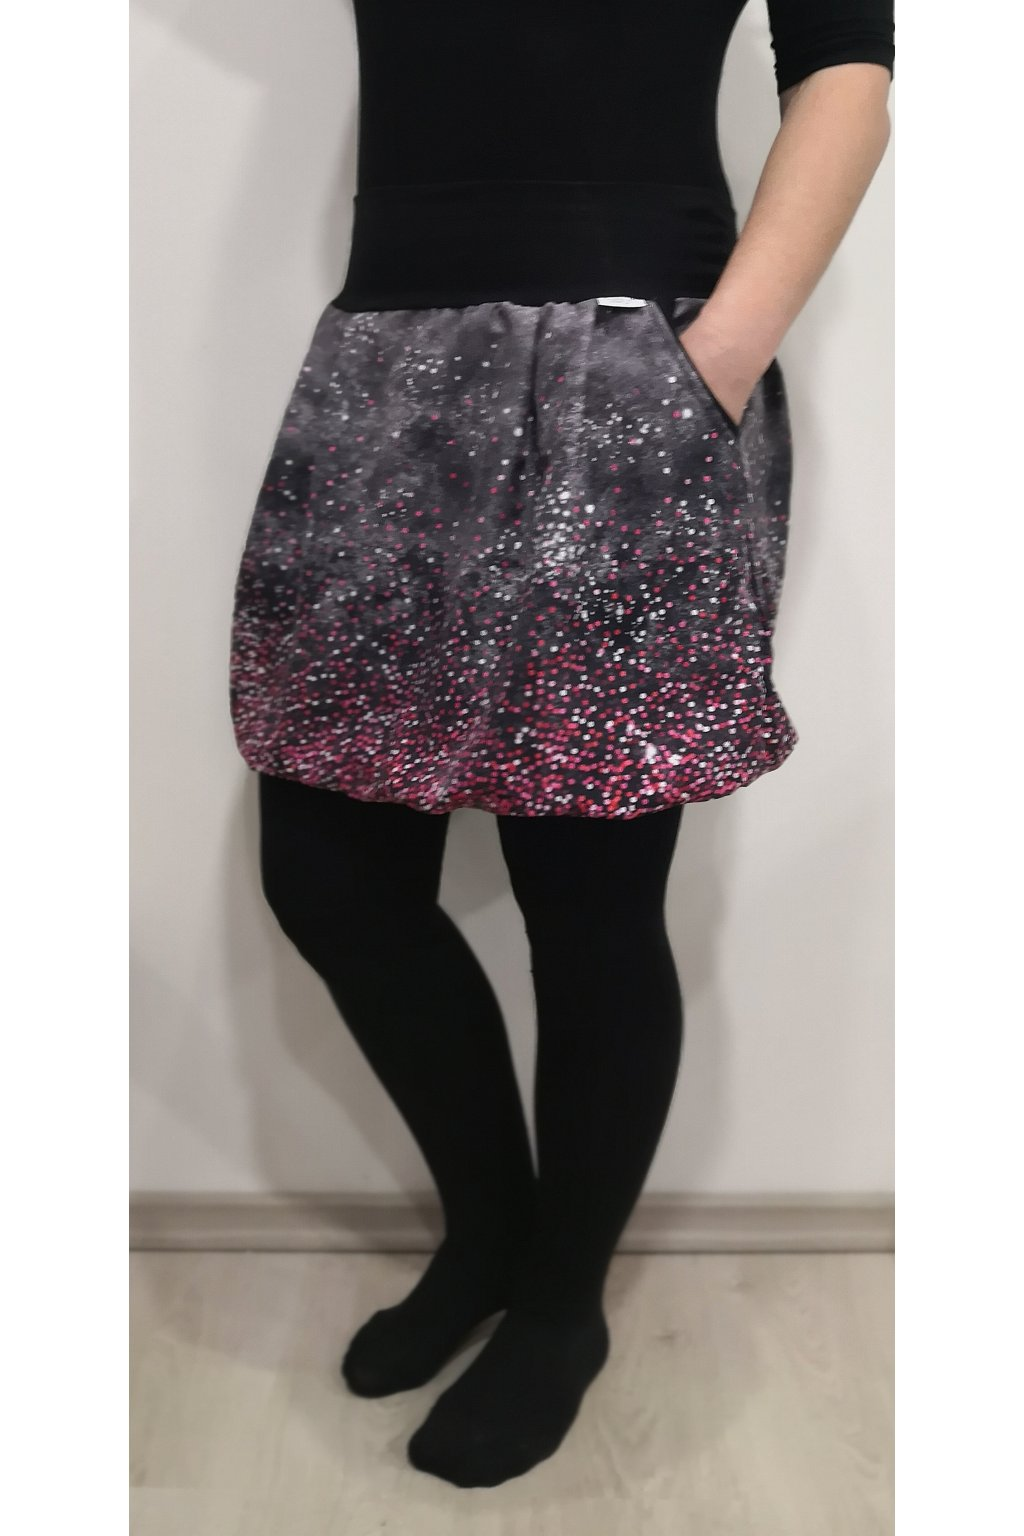 balonova sukne puntiky ruzove papilio clothing (1)